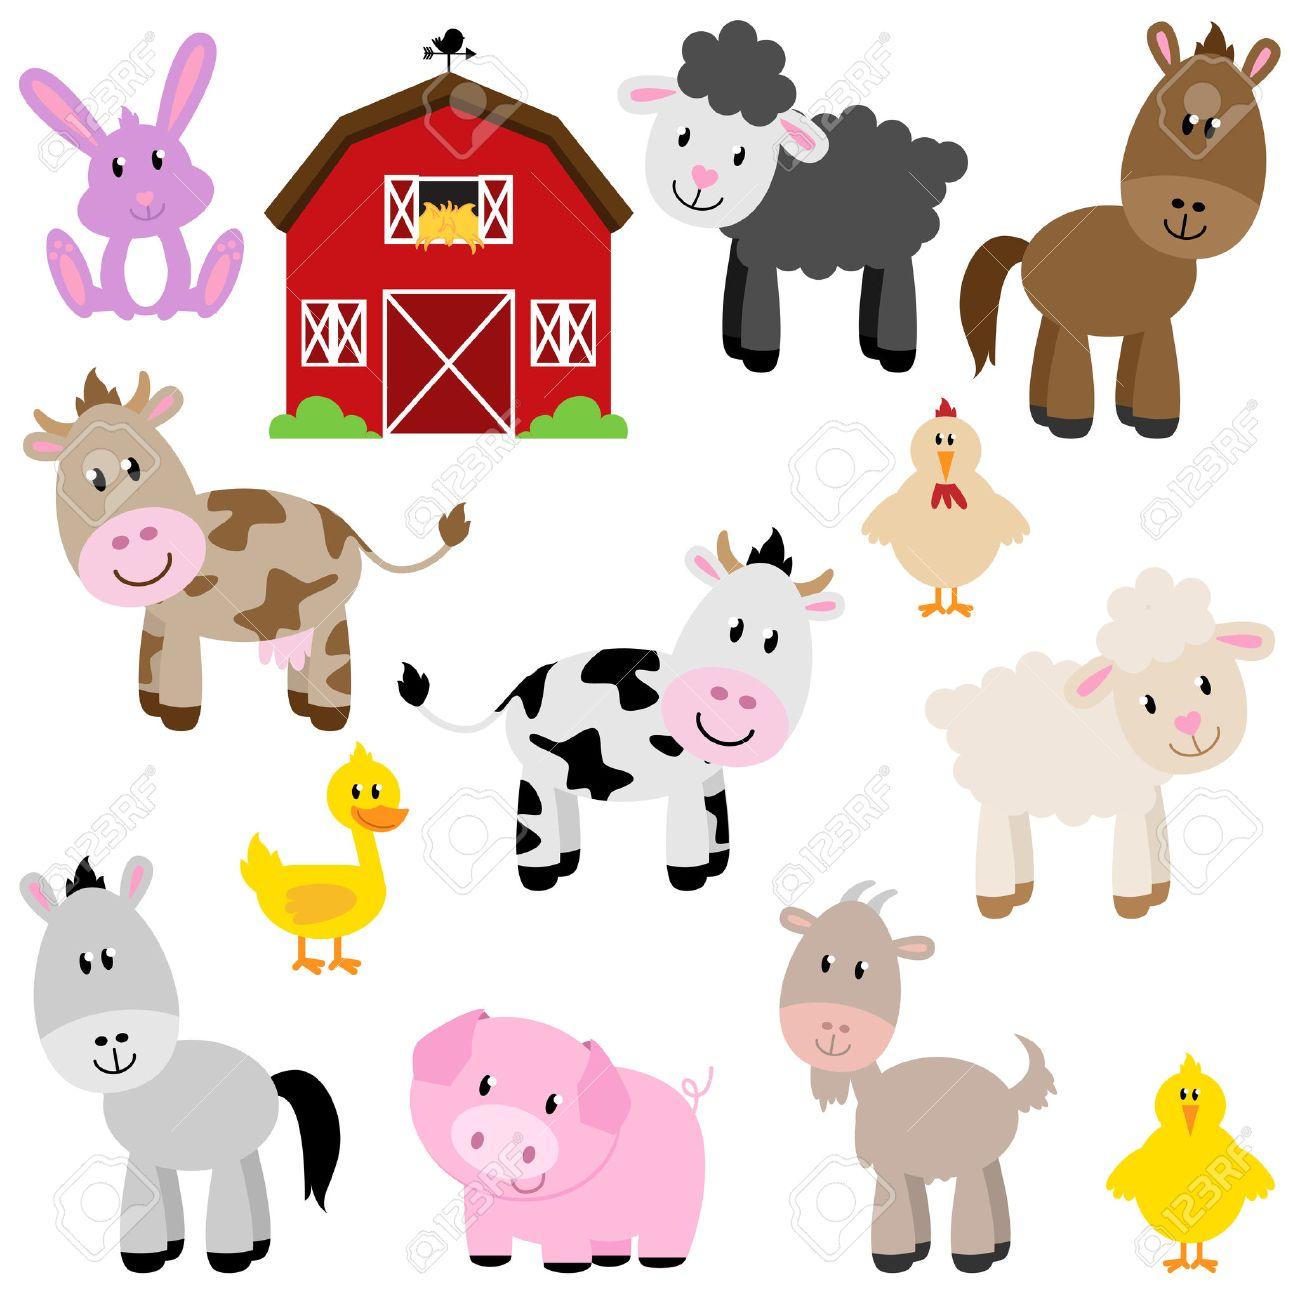 Vector Collection of Cute Cartoon Farm Animals and Barn Stock Vector - 29966159